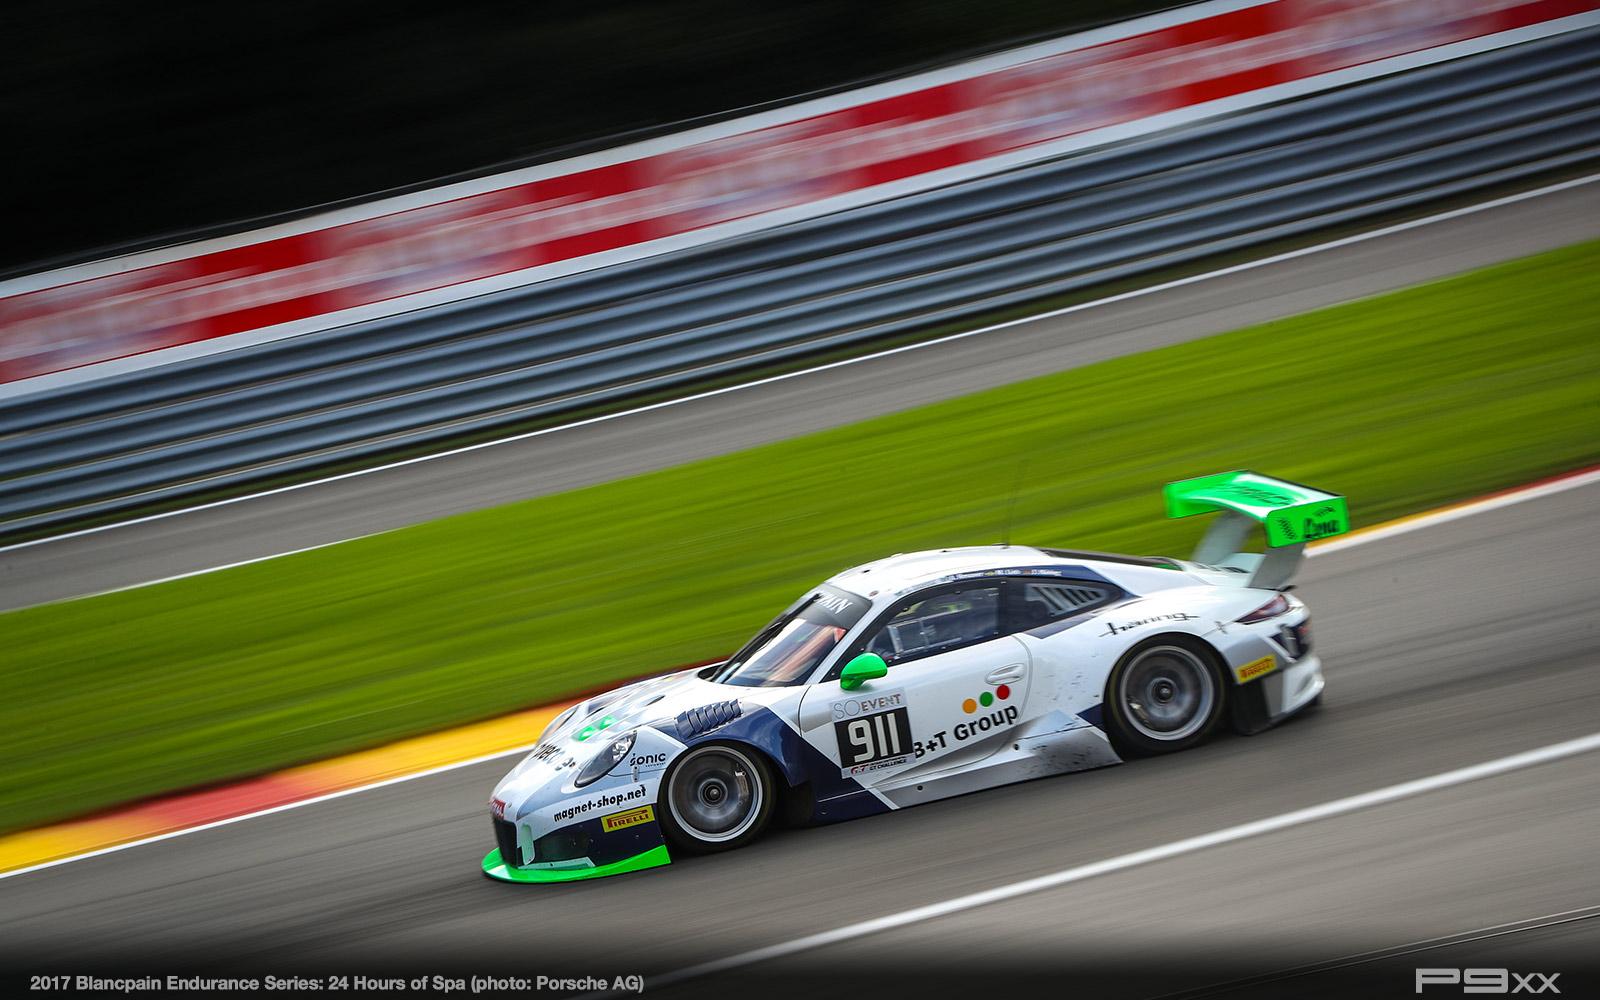 2017-24-Hours-of-Spa-Porsche-358